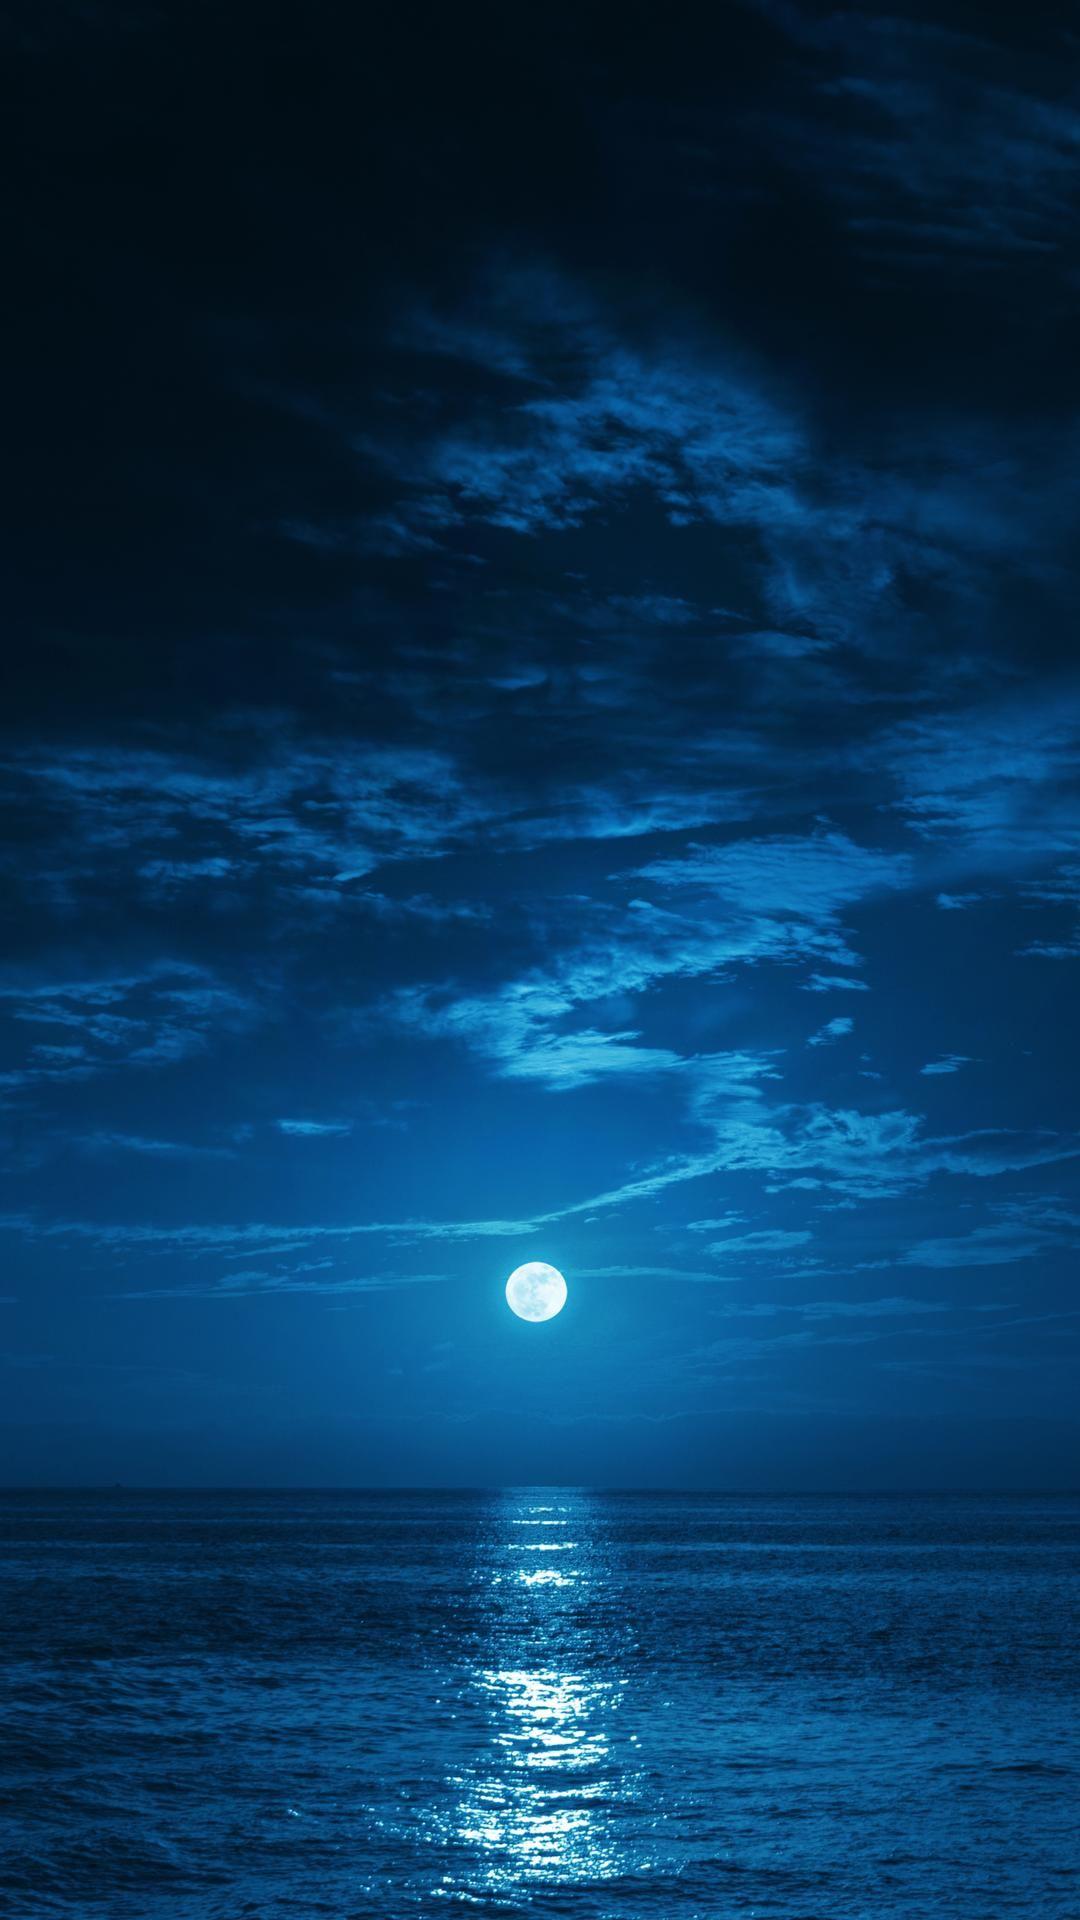 Phone Wallpaper Landscape Blue Ocean Sea 6wallpaper Wallpaprs Background Iphone Iphone11 Iphonewallpa Beautiful Moon Moon Photography Nature Photography